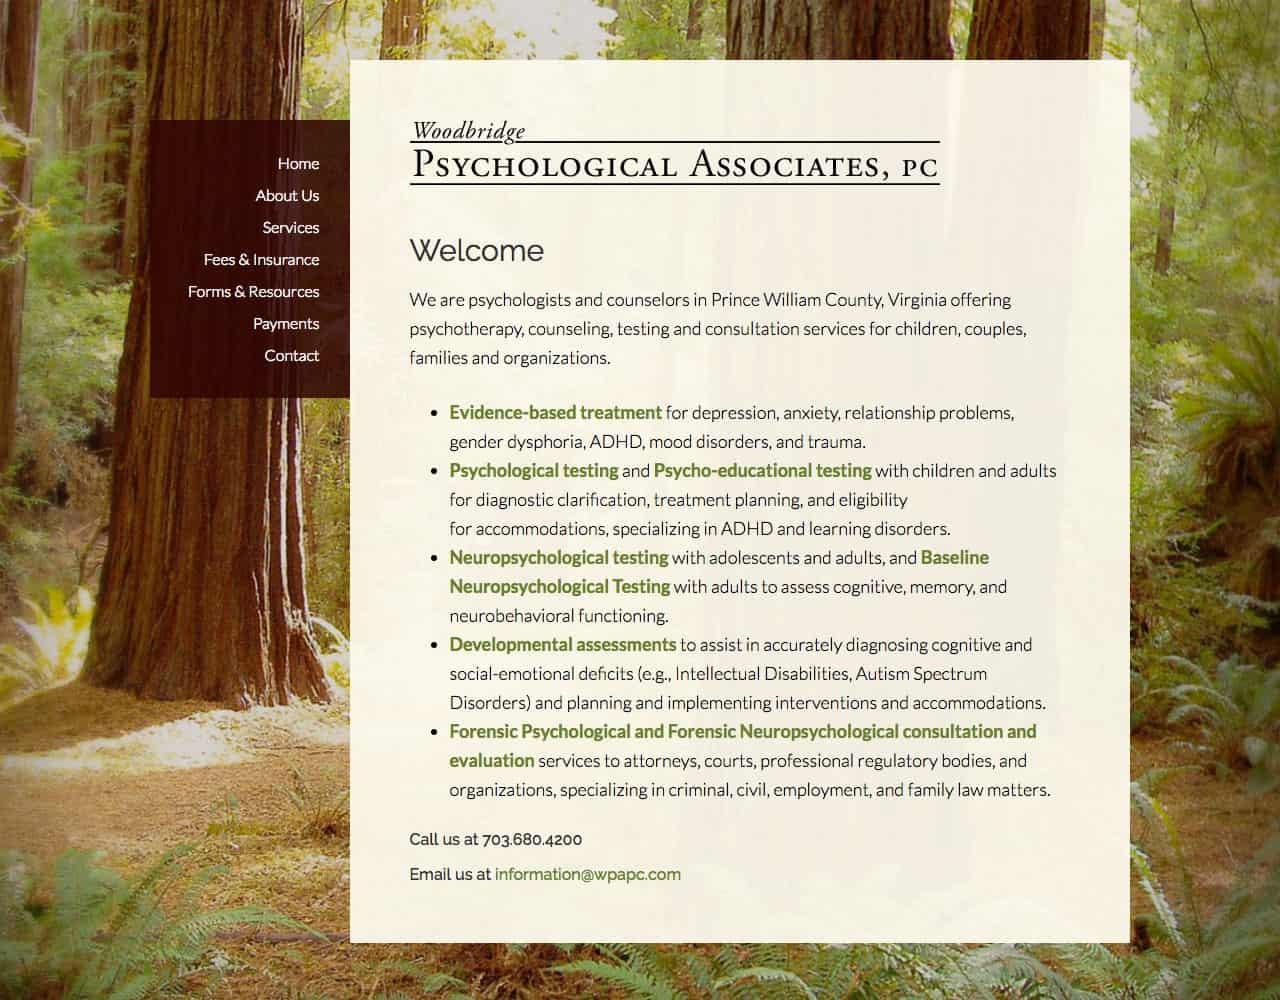 Woodbridge Psychological Associates, PC